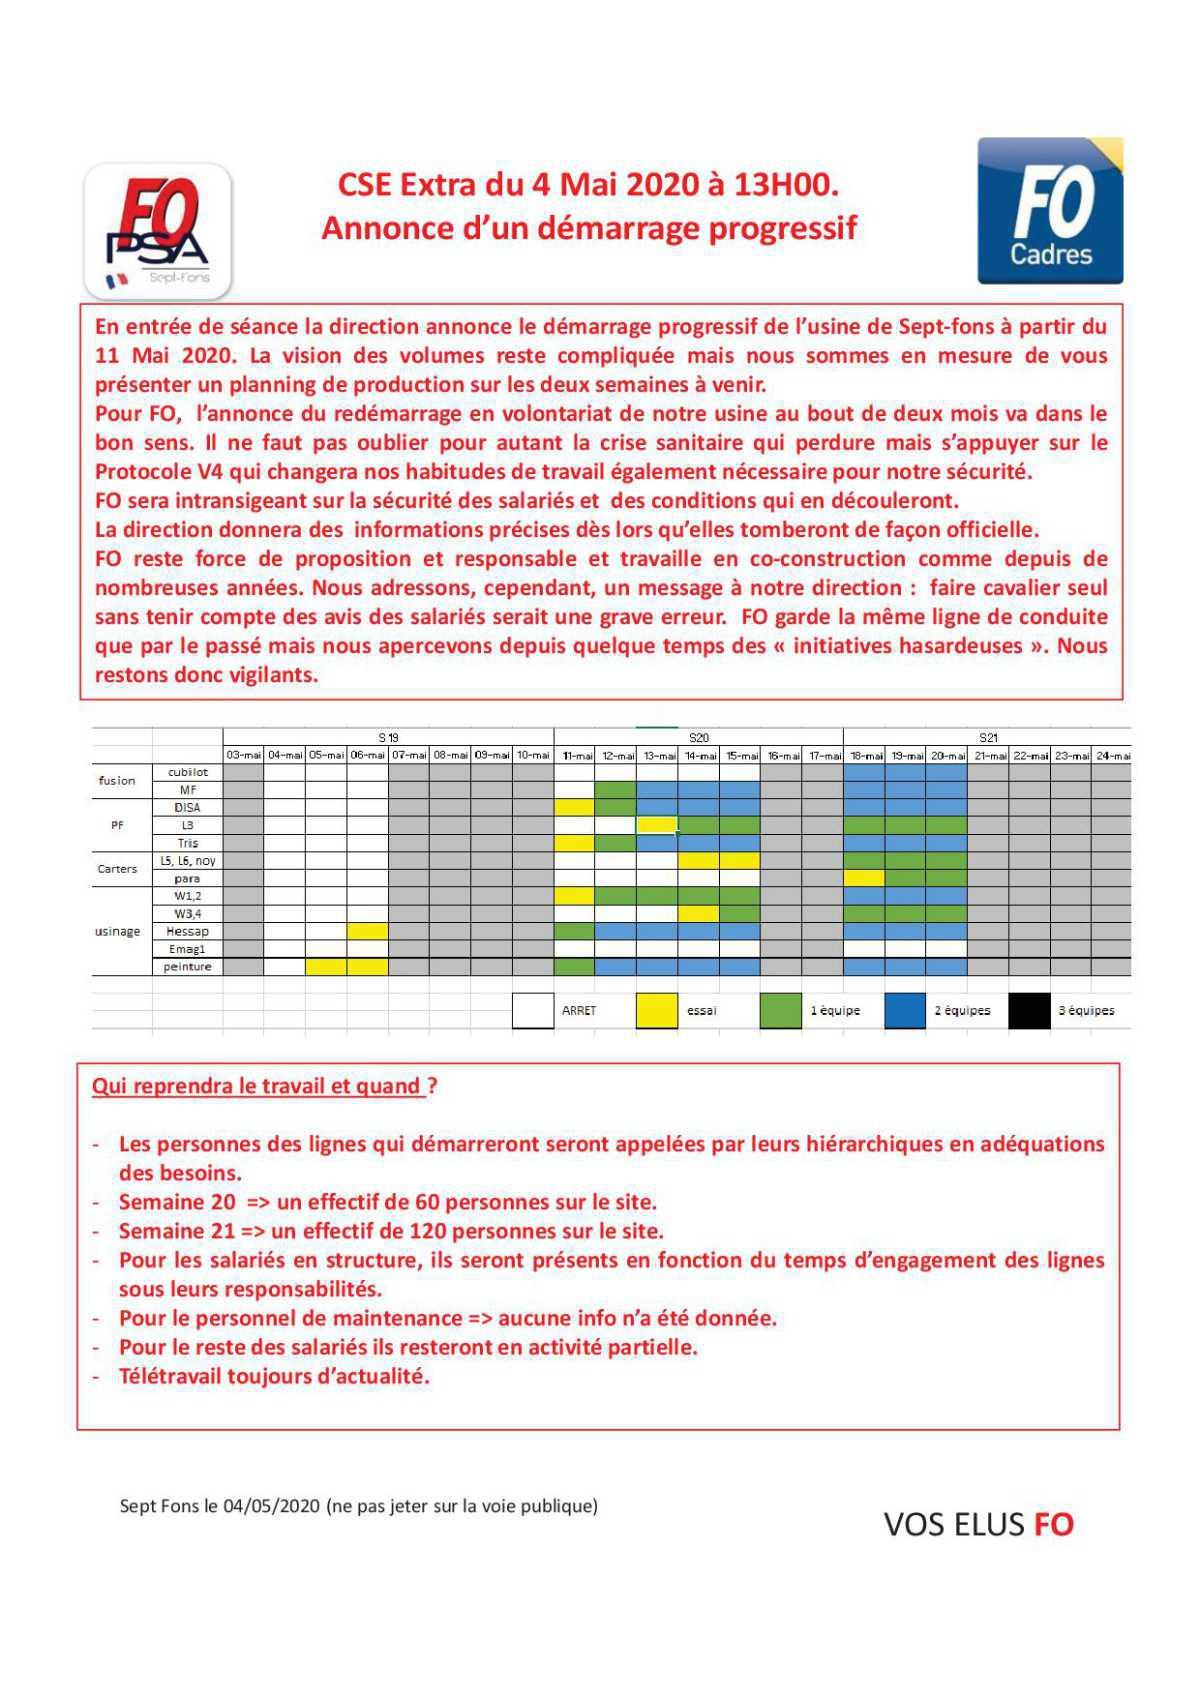 Compte rendu complet du CSE du 4 Mai 2020.